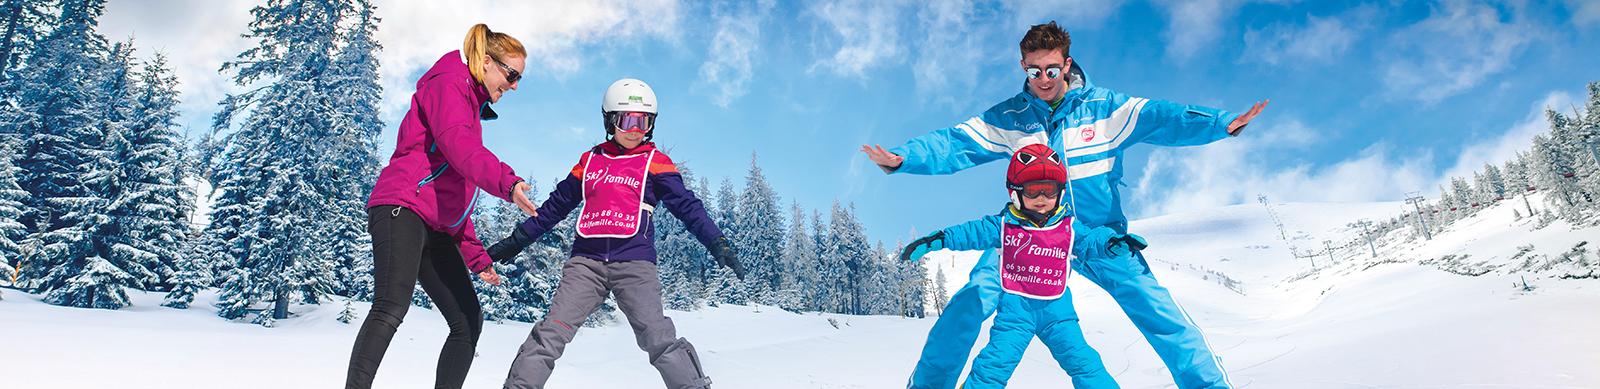 outdoor ski childcare